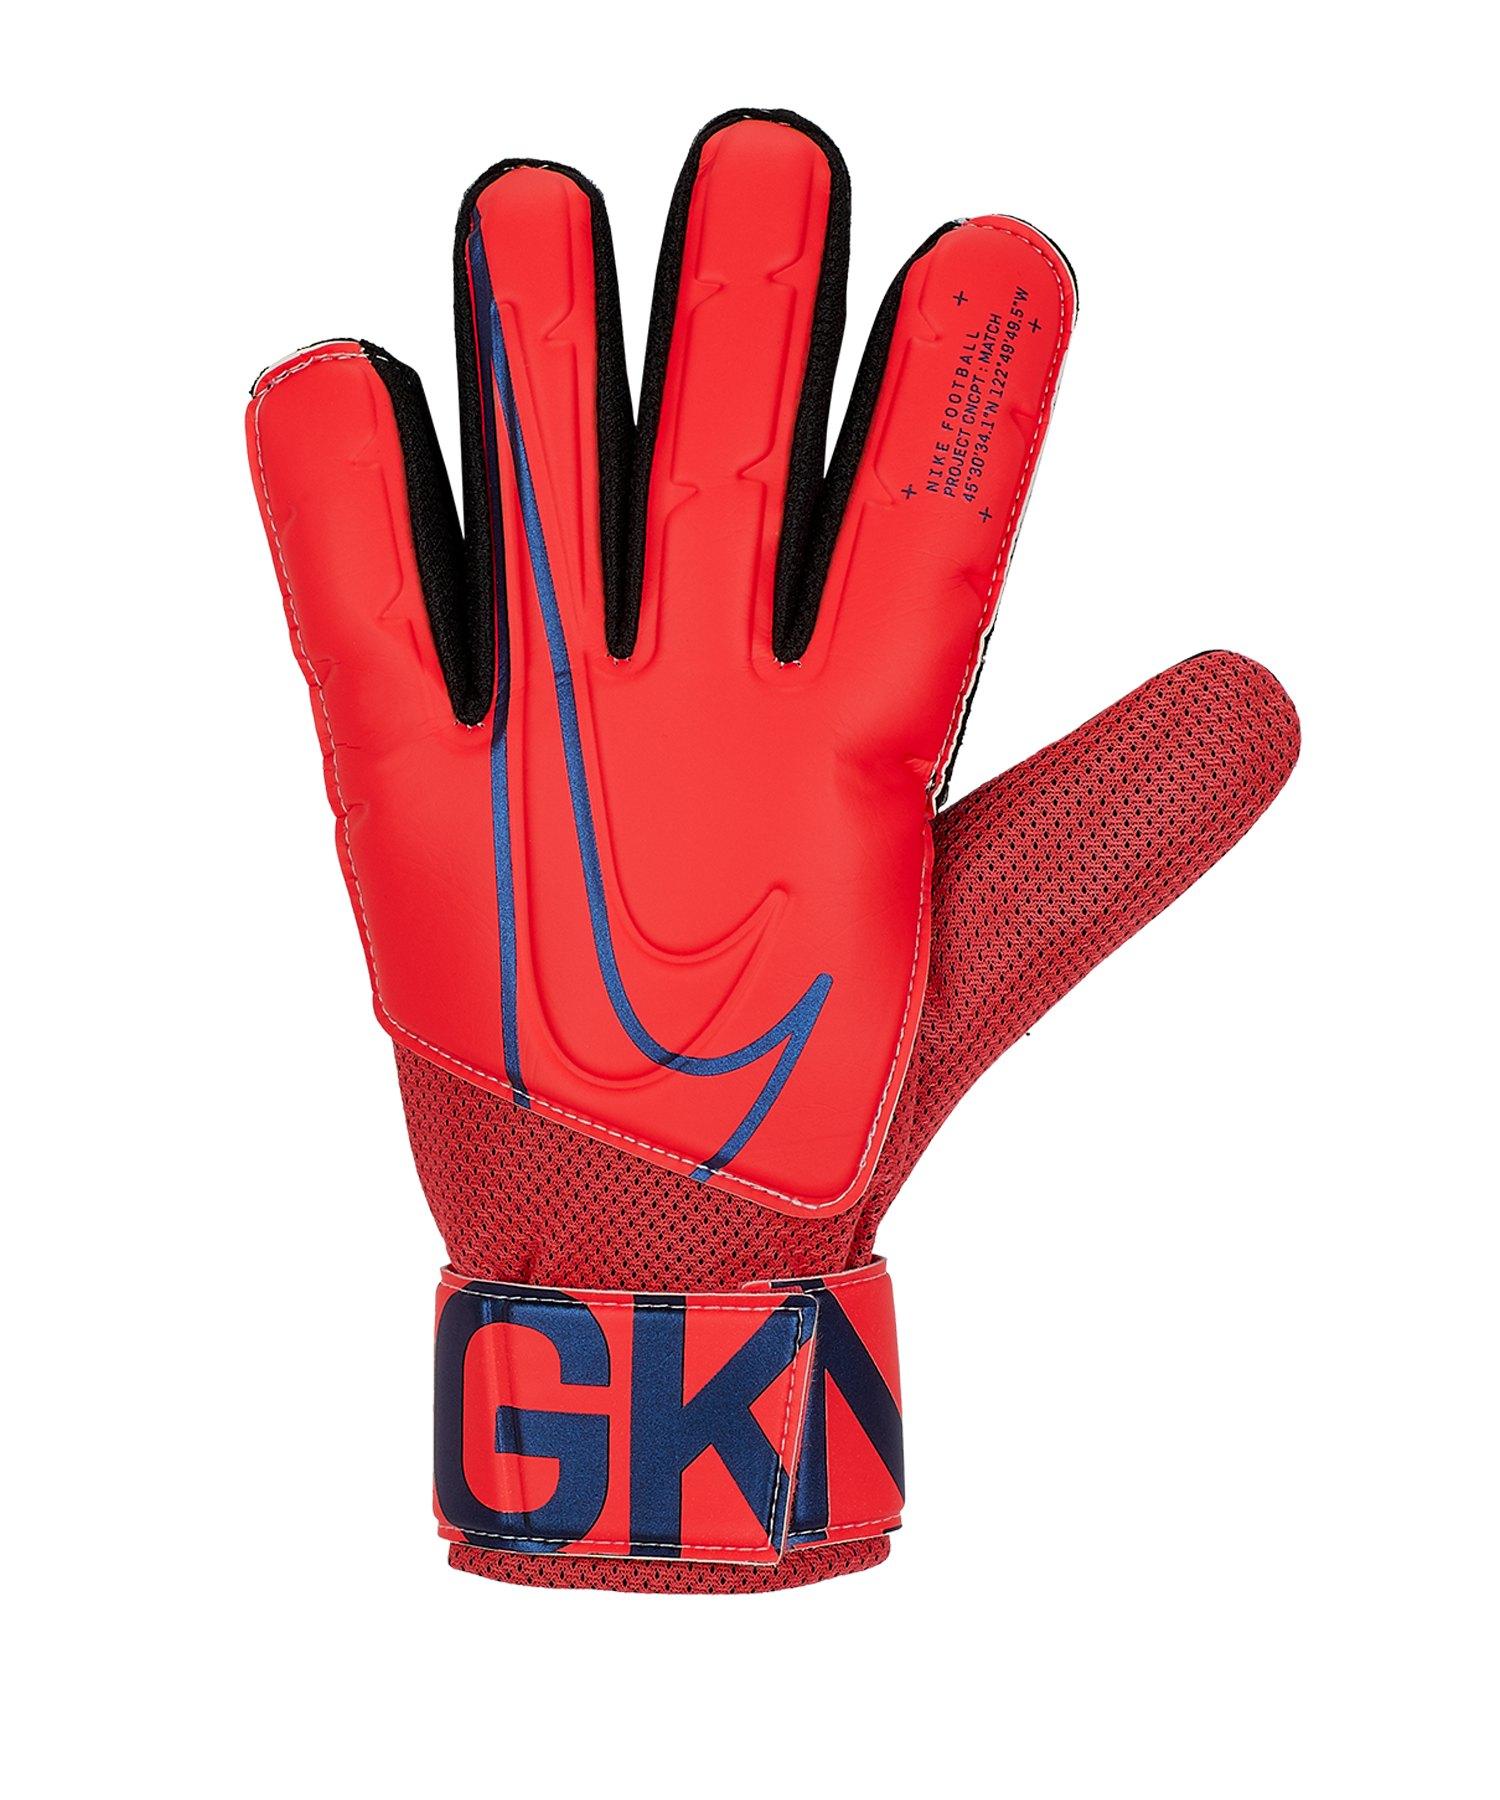 Nike Match Torwarthandschuh Rot F644 - rot